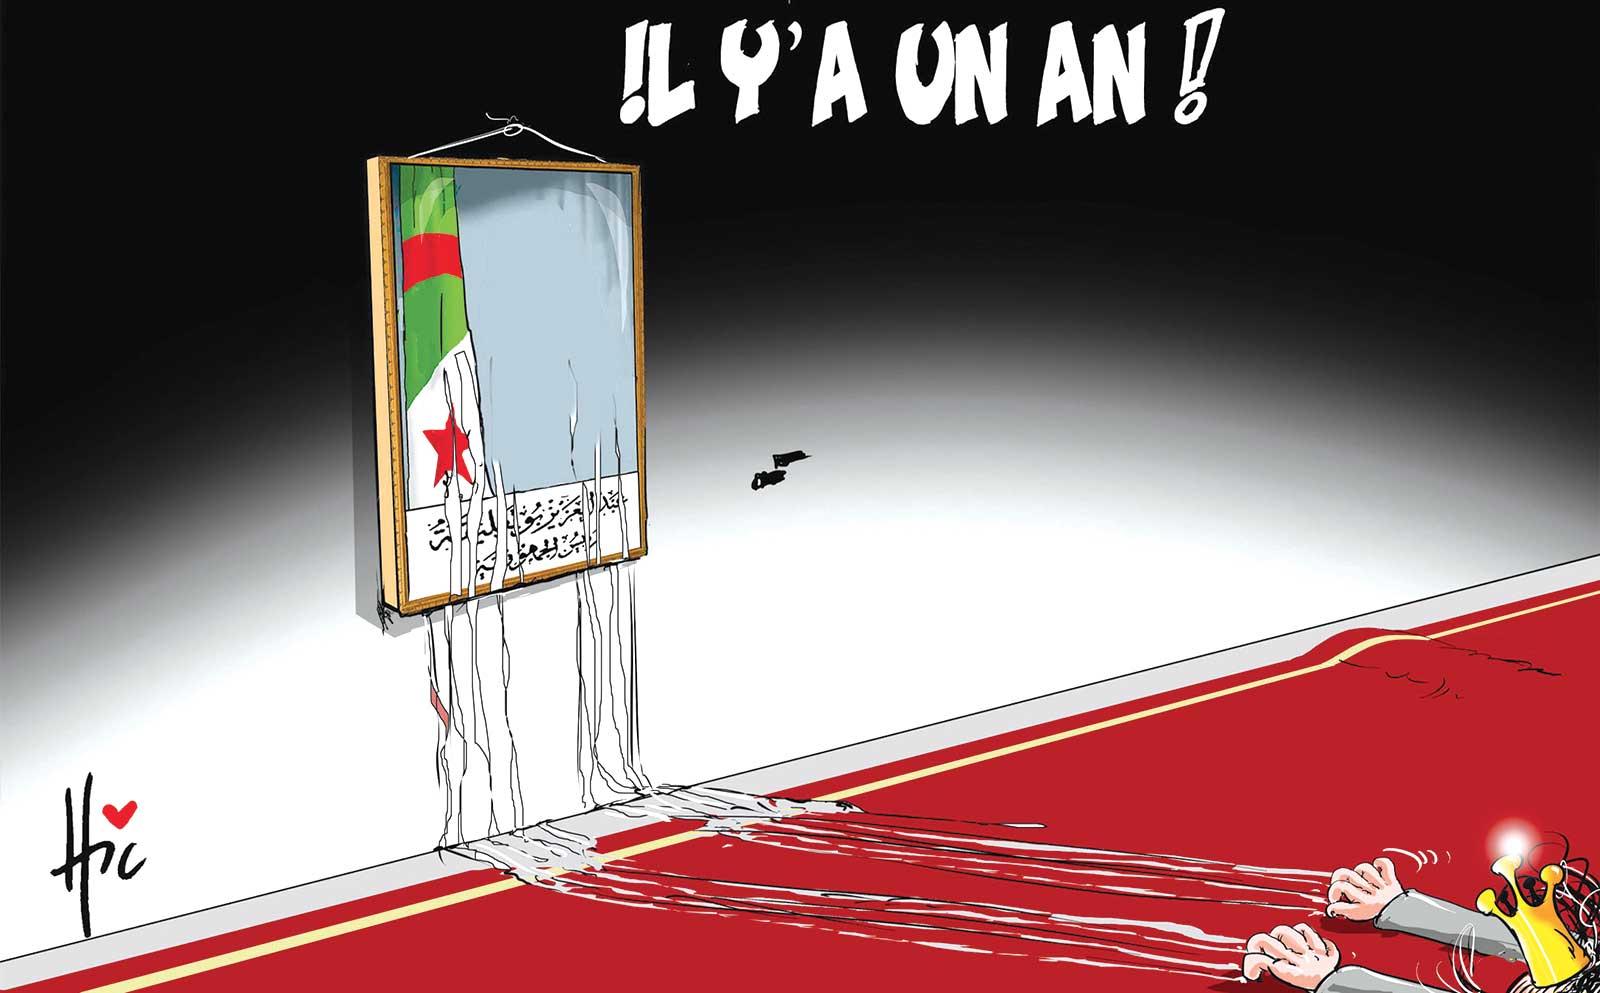 Bouteflika : Il y a un an ! - Dessins et Caricatures, Le Hic - El Watan - Gagdz.com